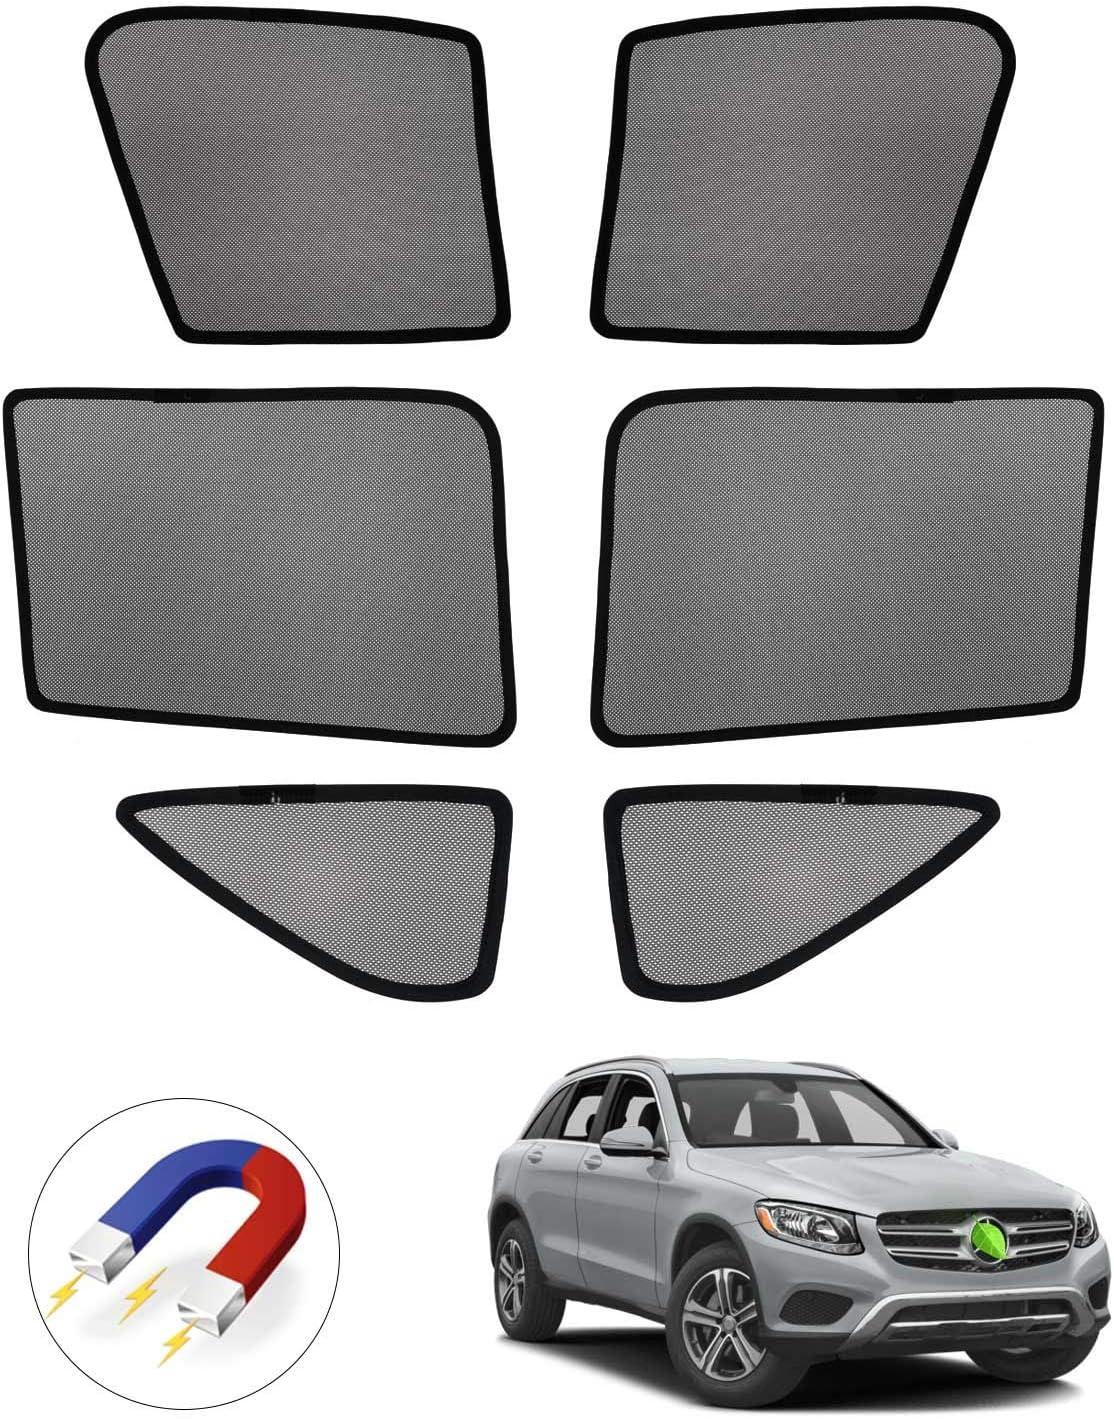 Mixsuper Car Window Shade Sun Protection Glare and UV Visor for Mercedes-Benz GLC-Class X205 GLC300 GLC350e GLC43 GLC63 SUV 2016-2020 Folding Side Window Sunshade Keeps Your Vehicle Cool 4 PCS